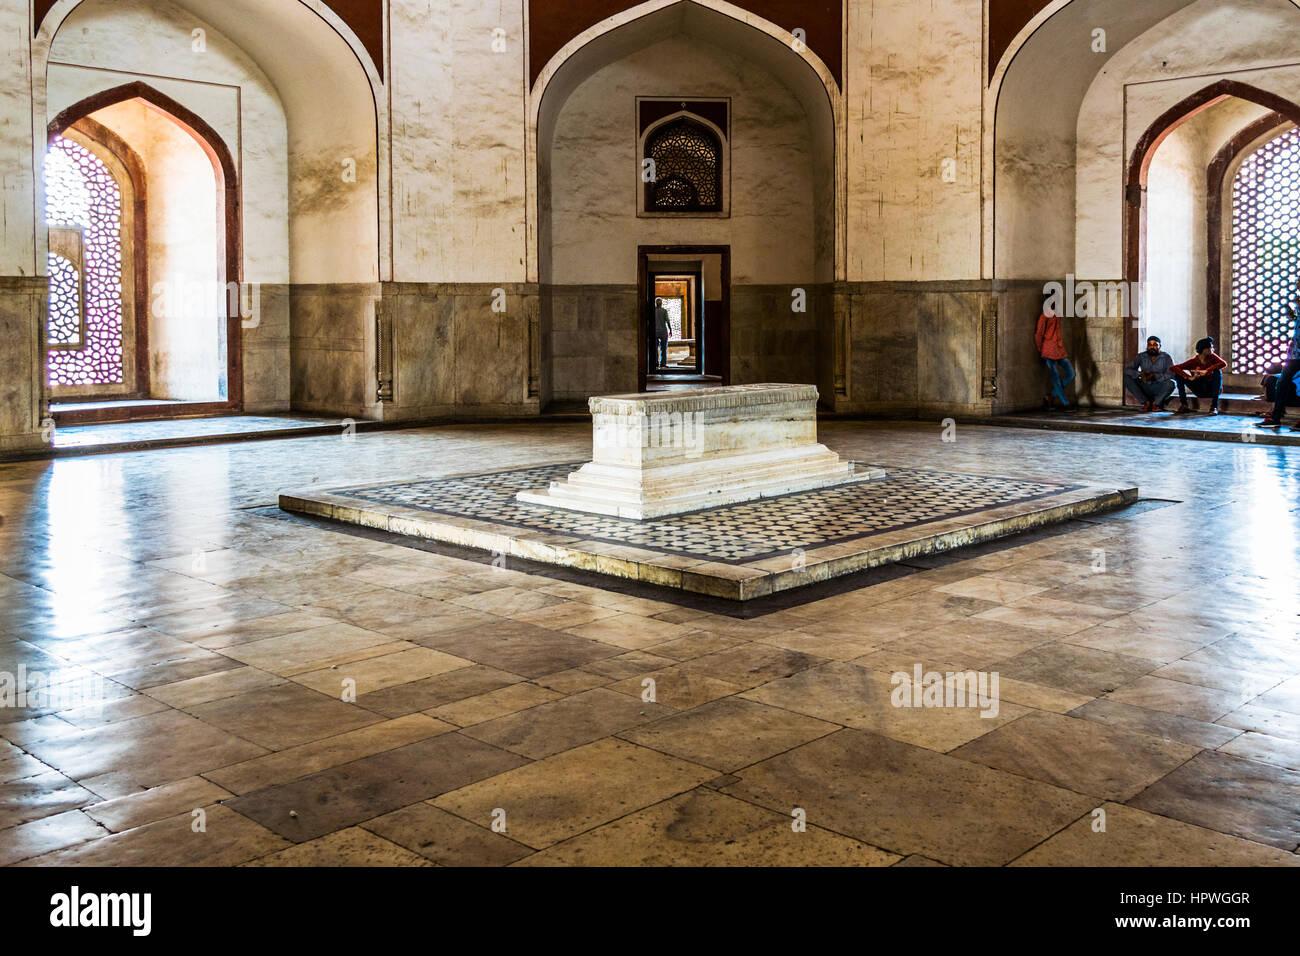 Burials place of Mughal Emperor Humayun, father of Great Akbar at Humayun's Tomb, Delhi - Stock Image